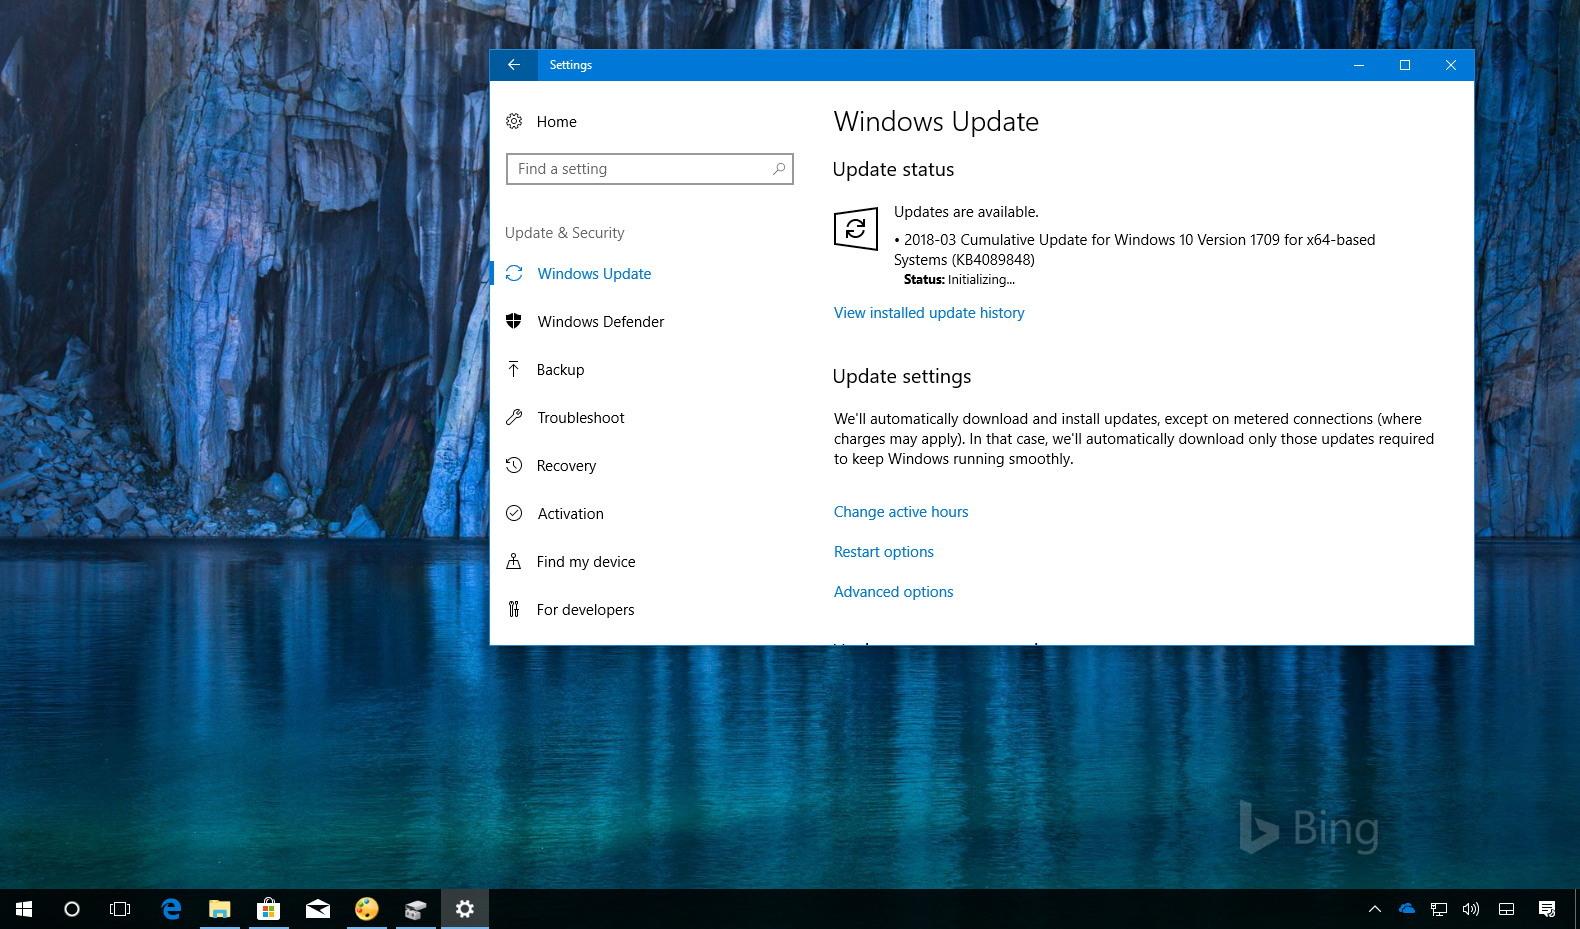 KB4089848 update for Windows 10 version 1709